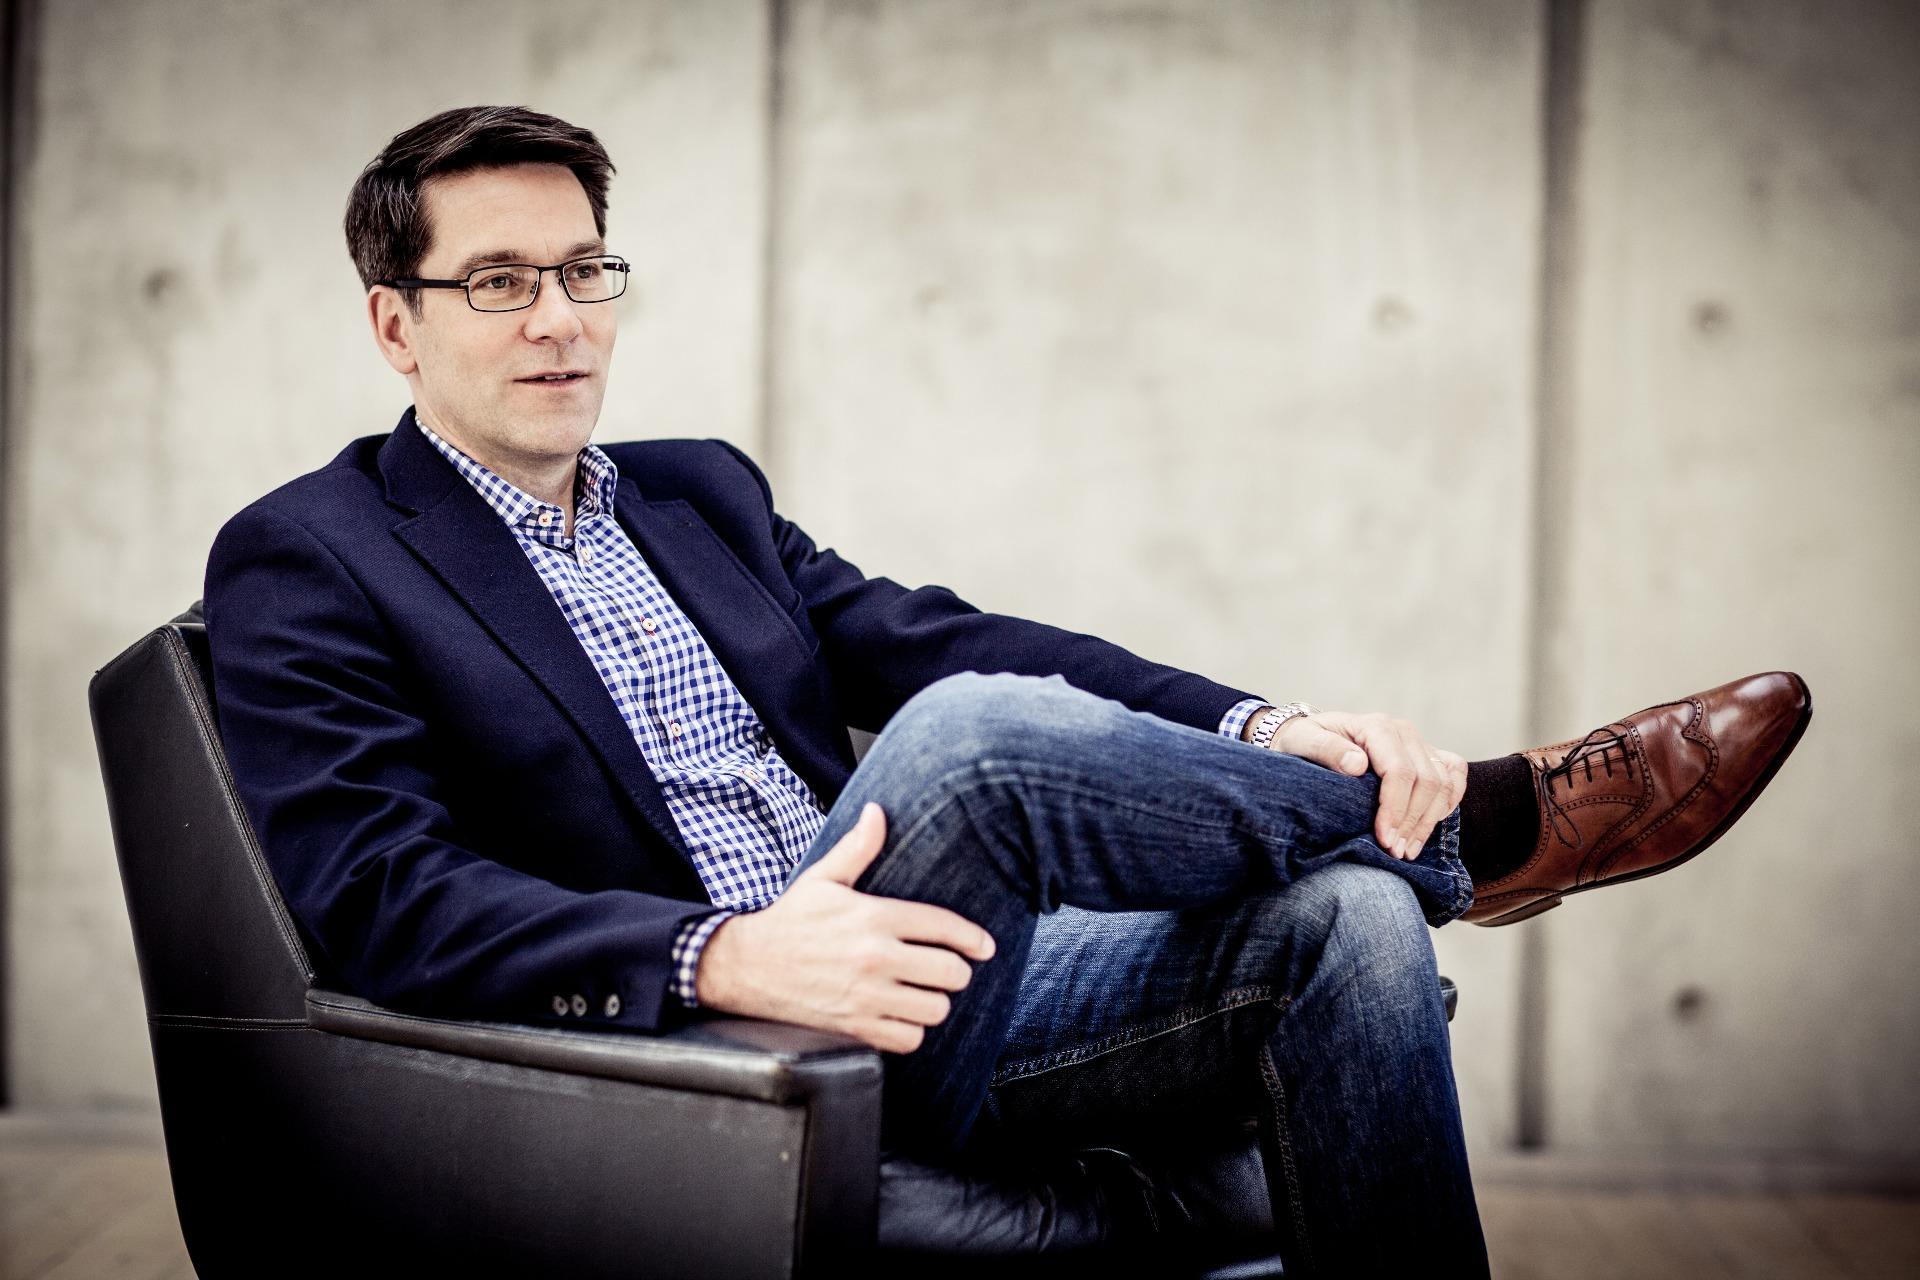 Alexander Birken set to be new Otto Group Chairman next year